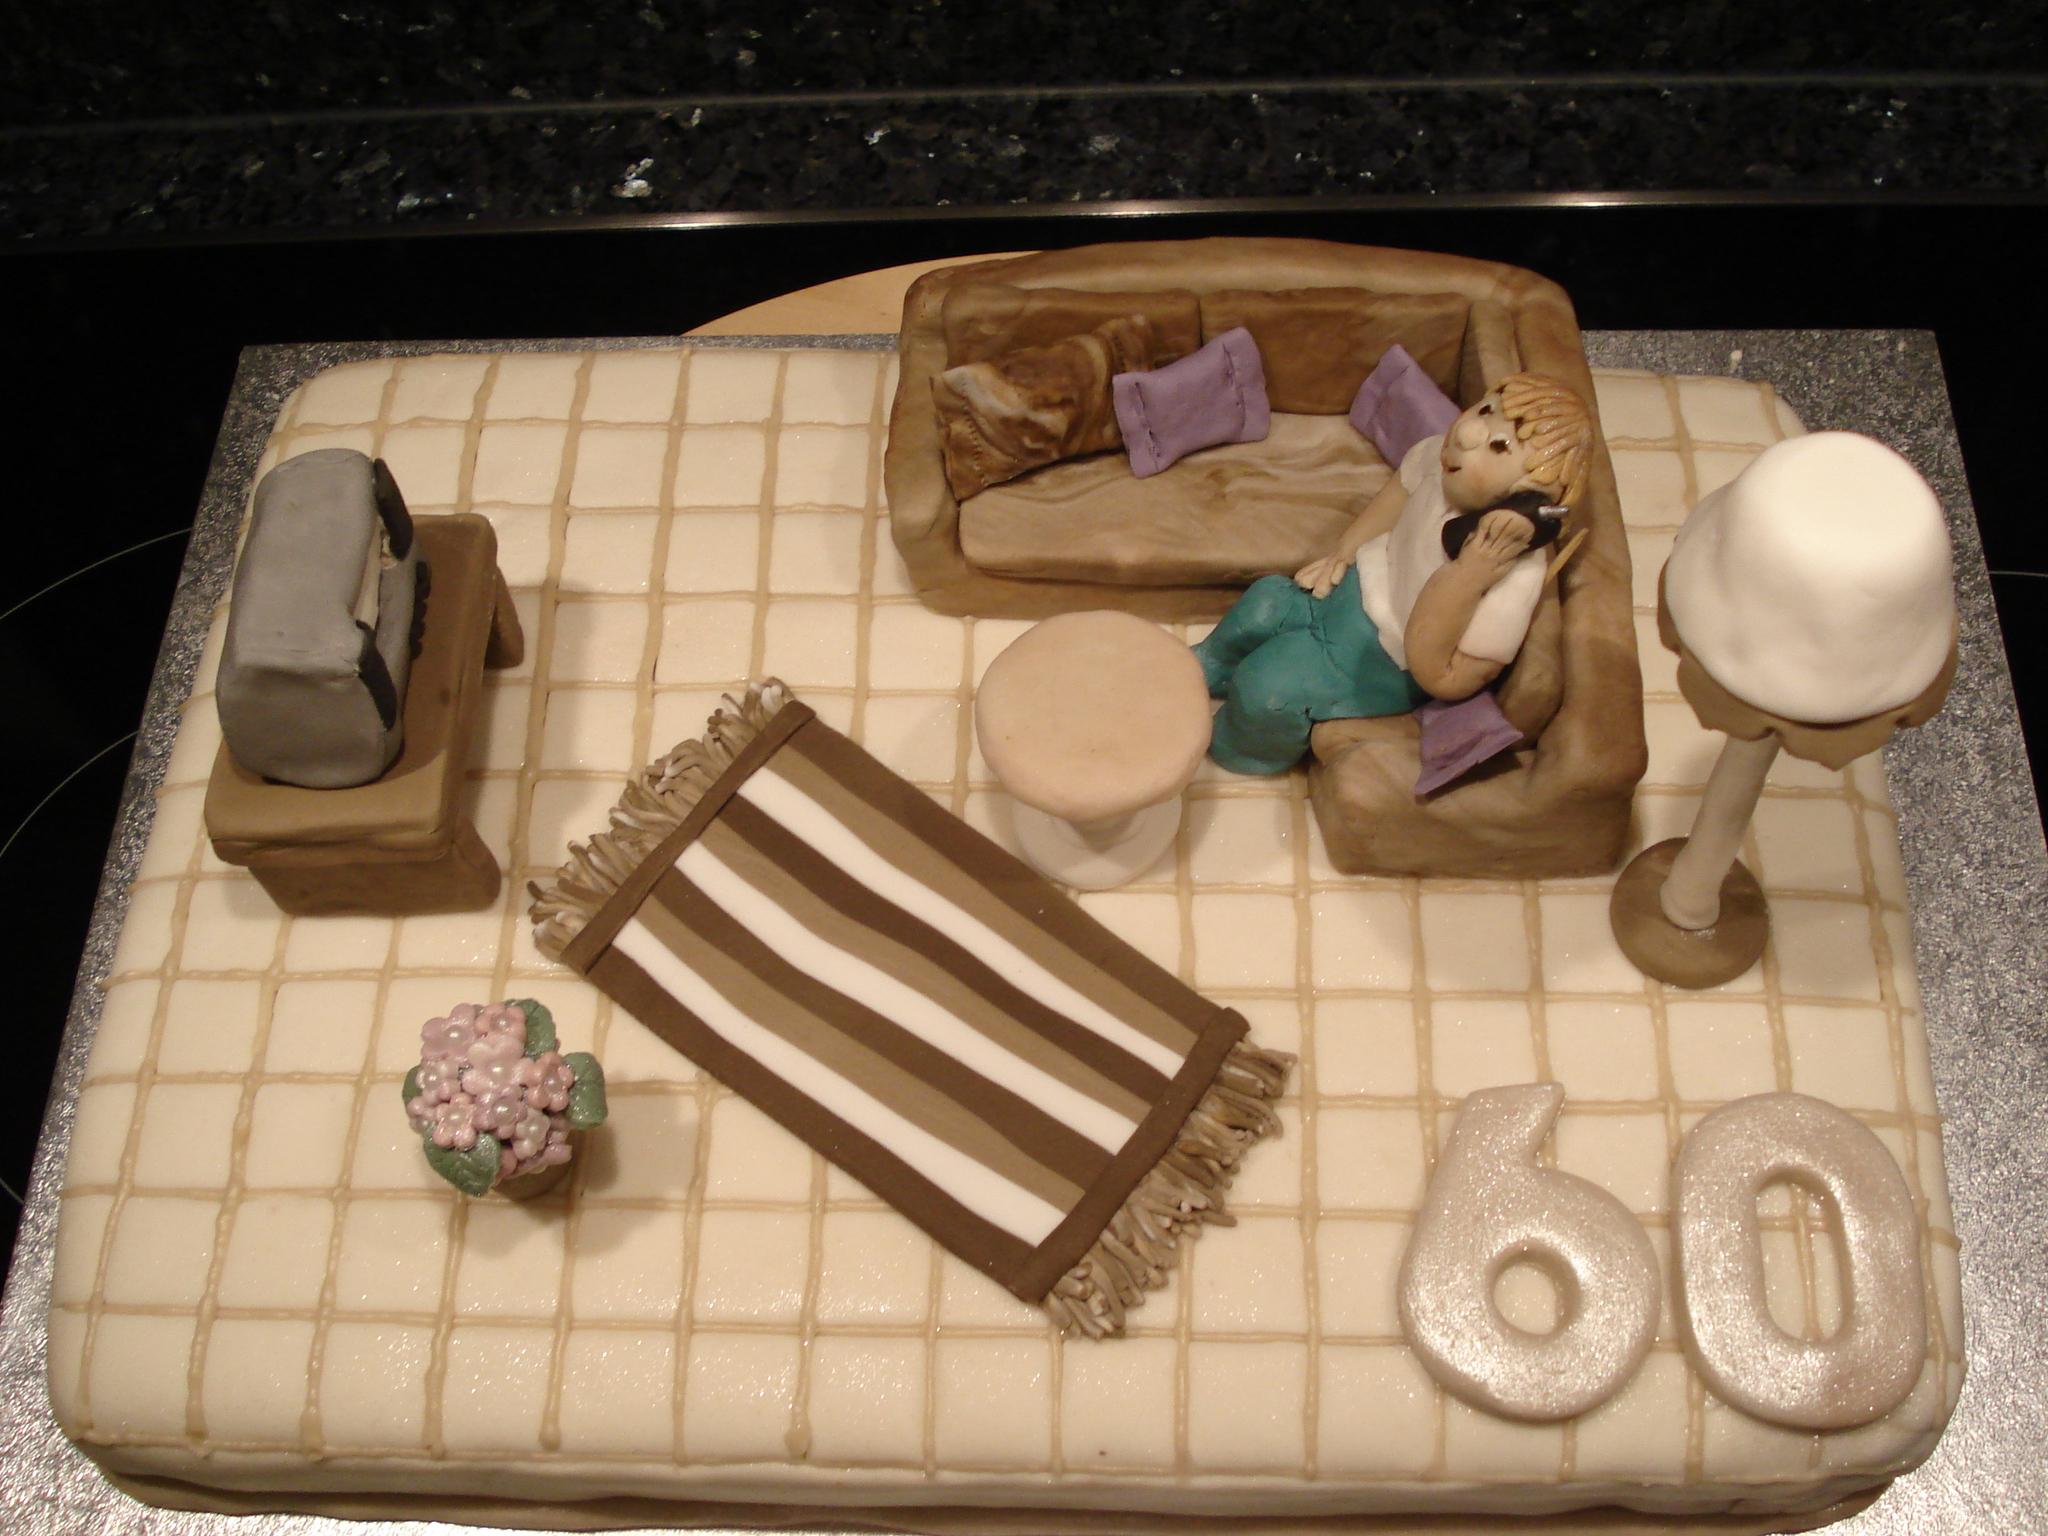 Как оформить торт в домашних условиях фото для мужчин